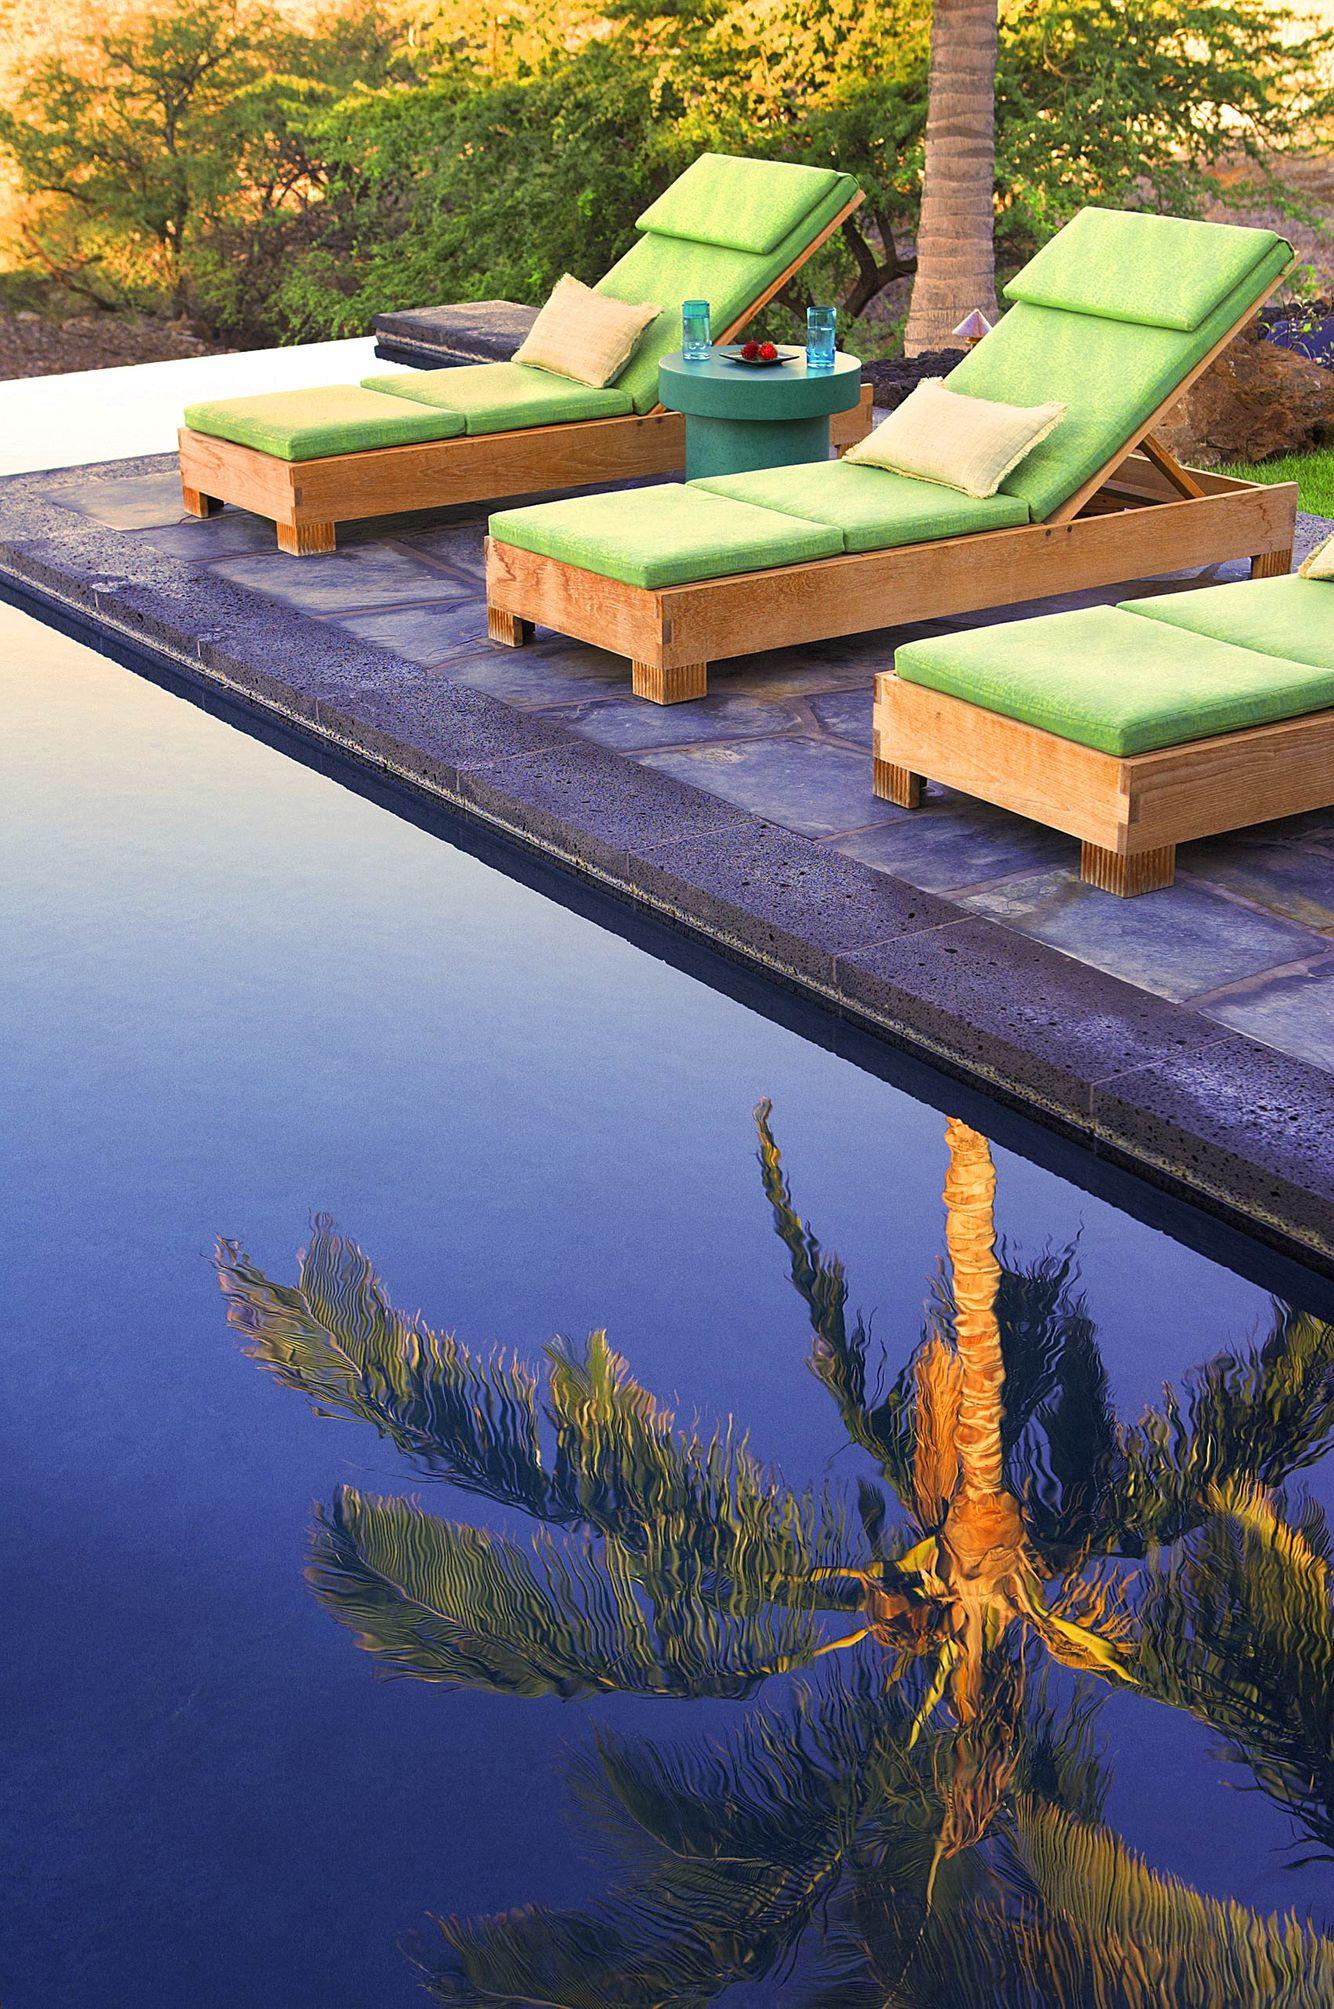 John-Sutton-Photography-HaleHo'oluana Pool